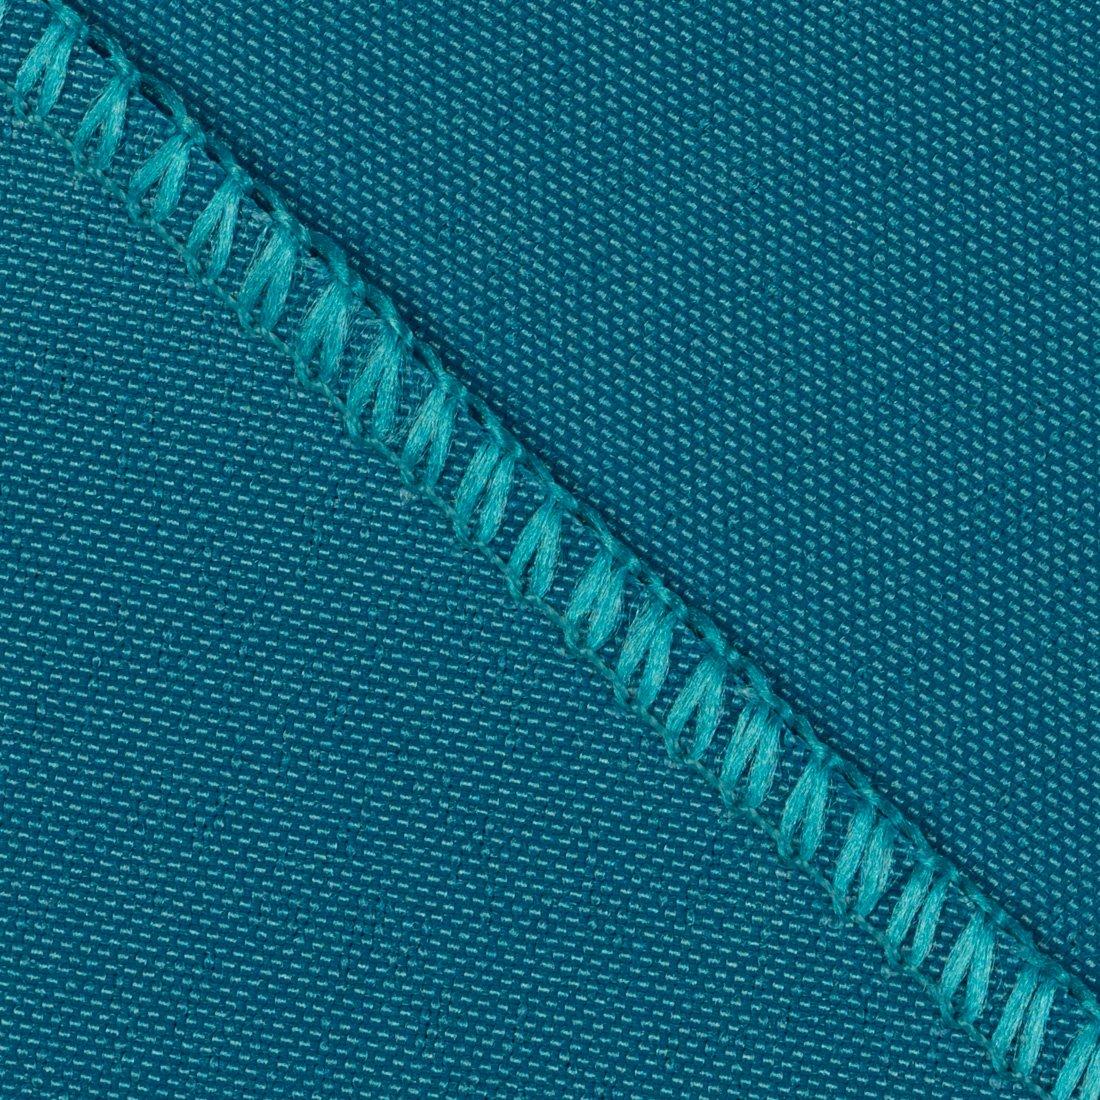 Hunter Green 17NPK-010165 LinenTablecloth 17-Inch Polyester Napkins 1-Dozen